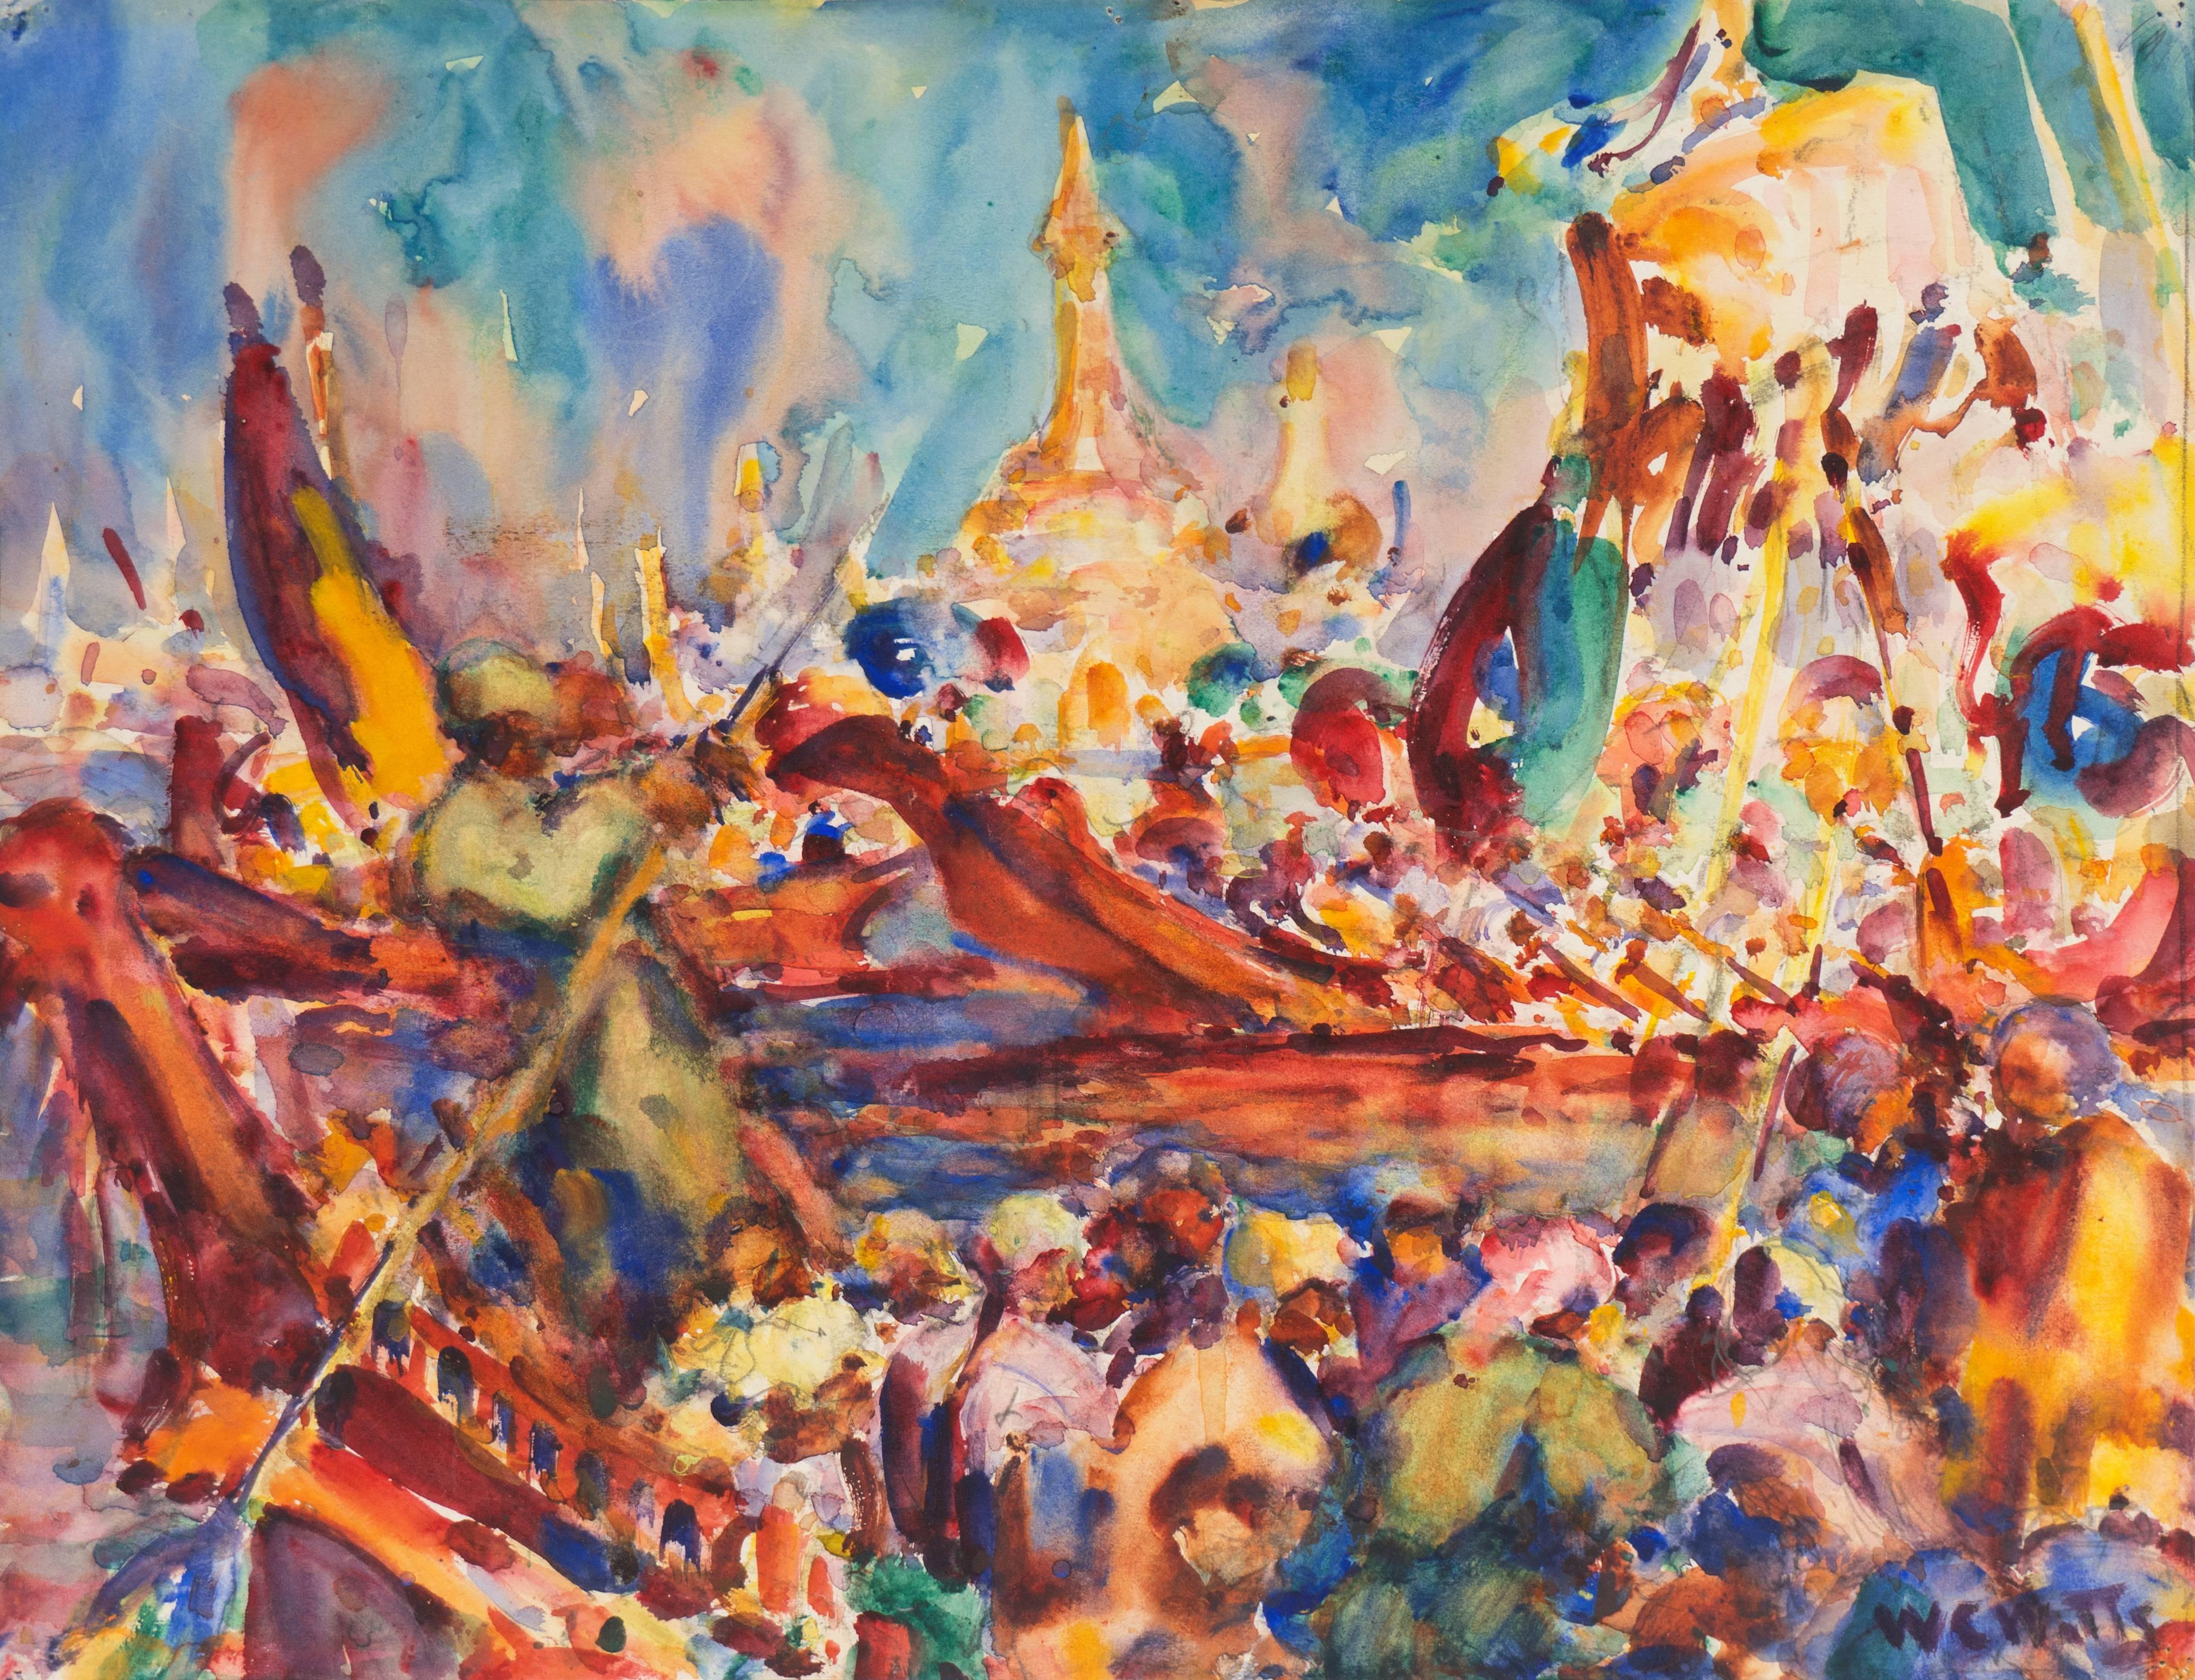 'Burmese Water Pageant', California Post-Impressionist, PAFA, AIC, Carmel